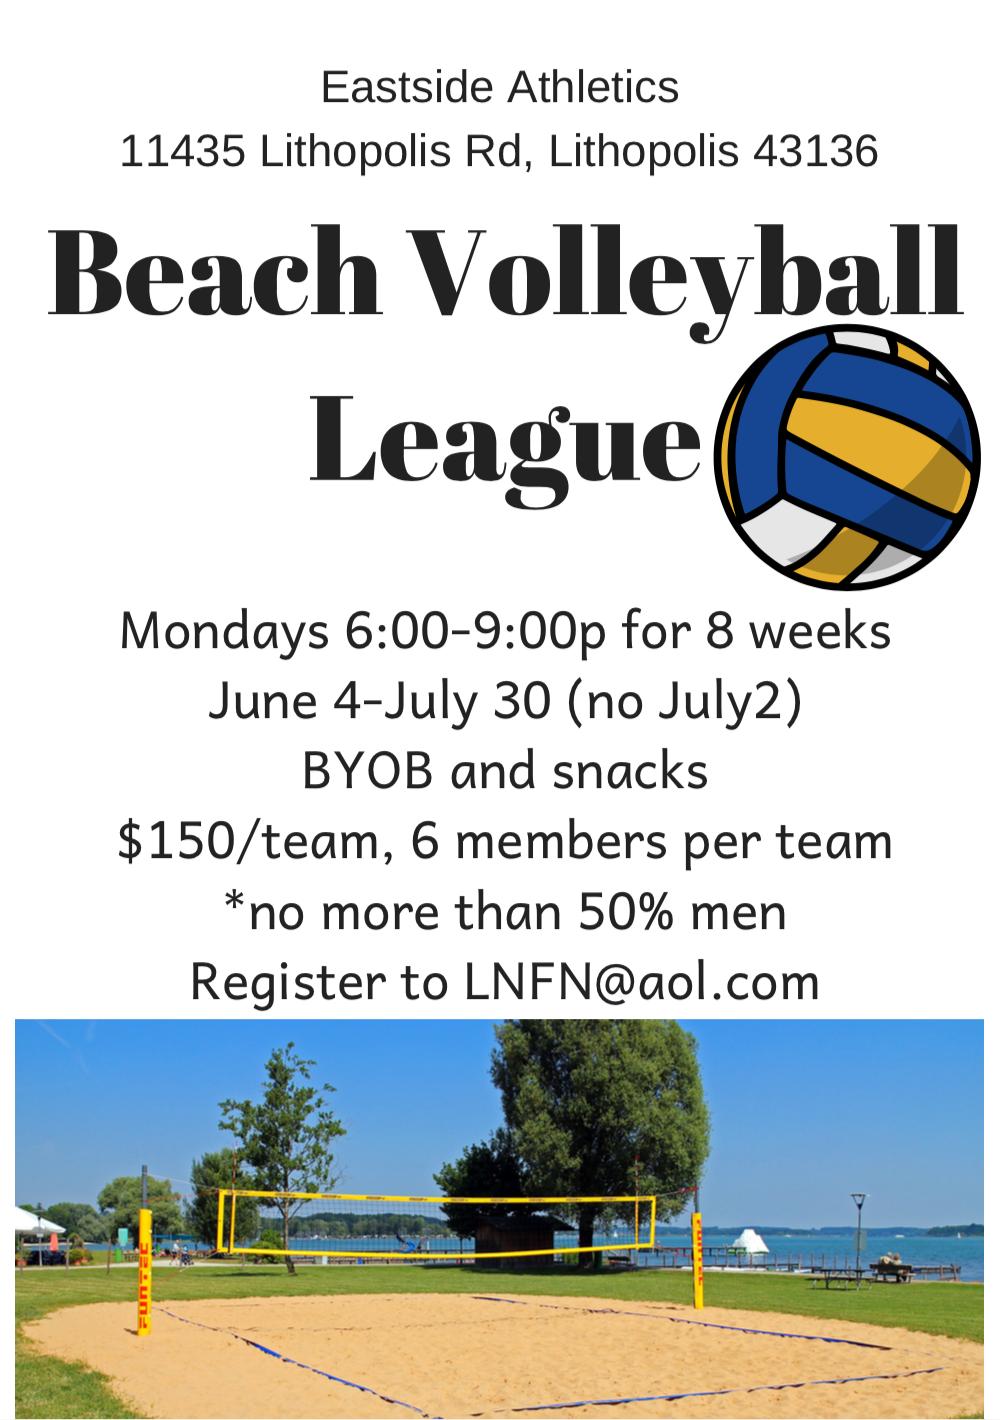 ESA Beach Volleyball